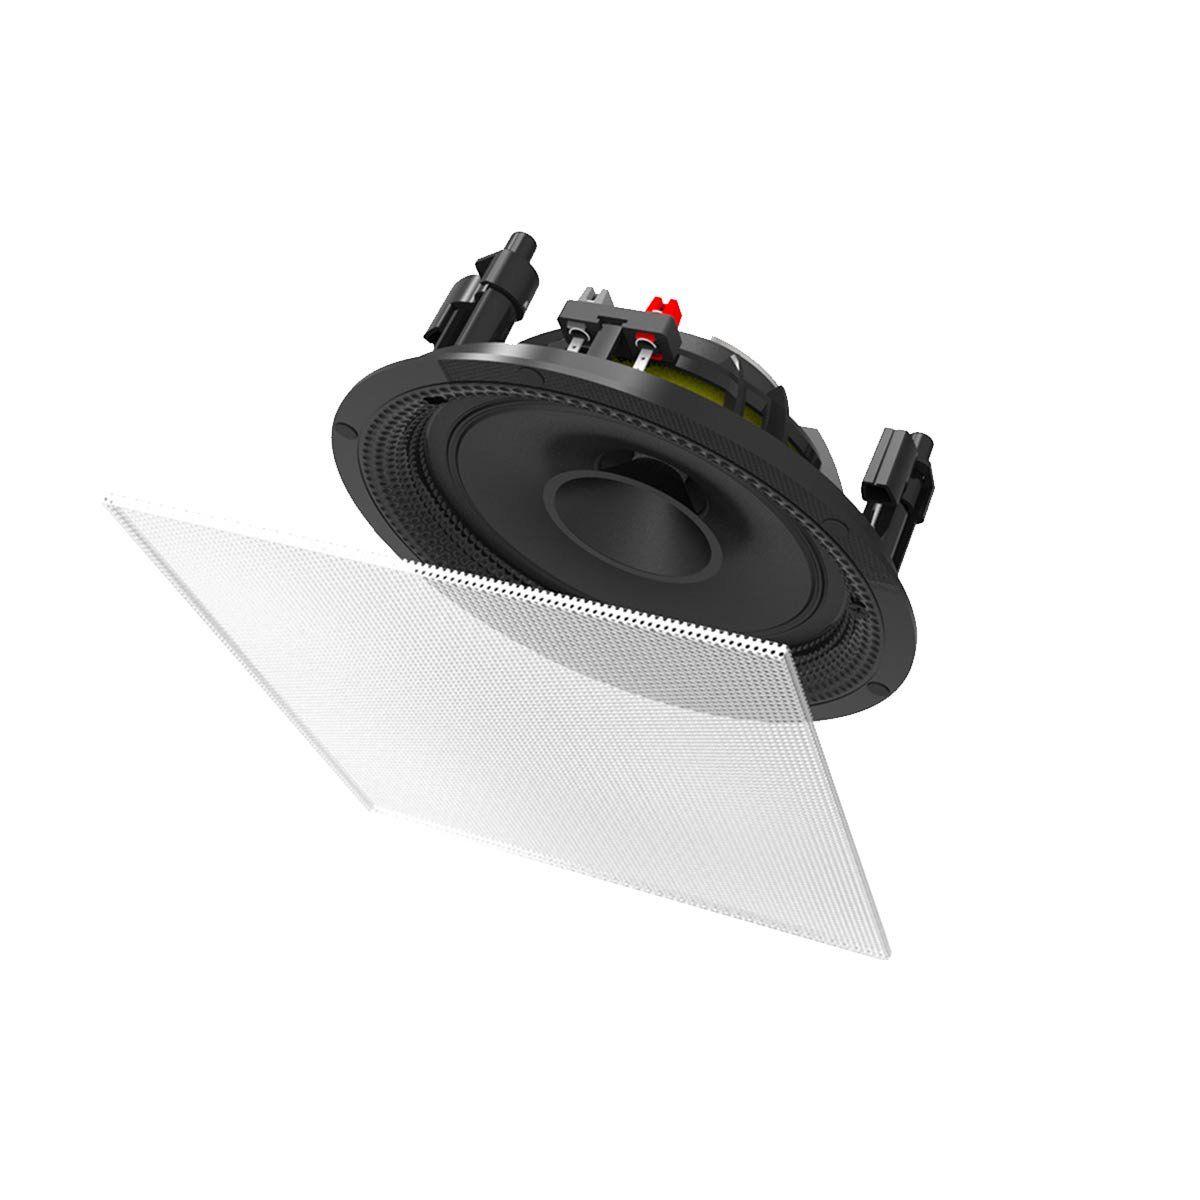 Arandela Full Range Quadrada Fal 6.5 Pol 40W - S 2 BSA